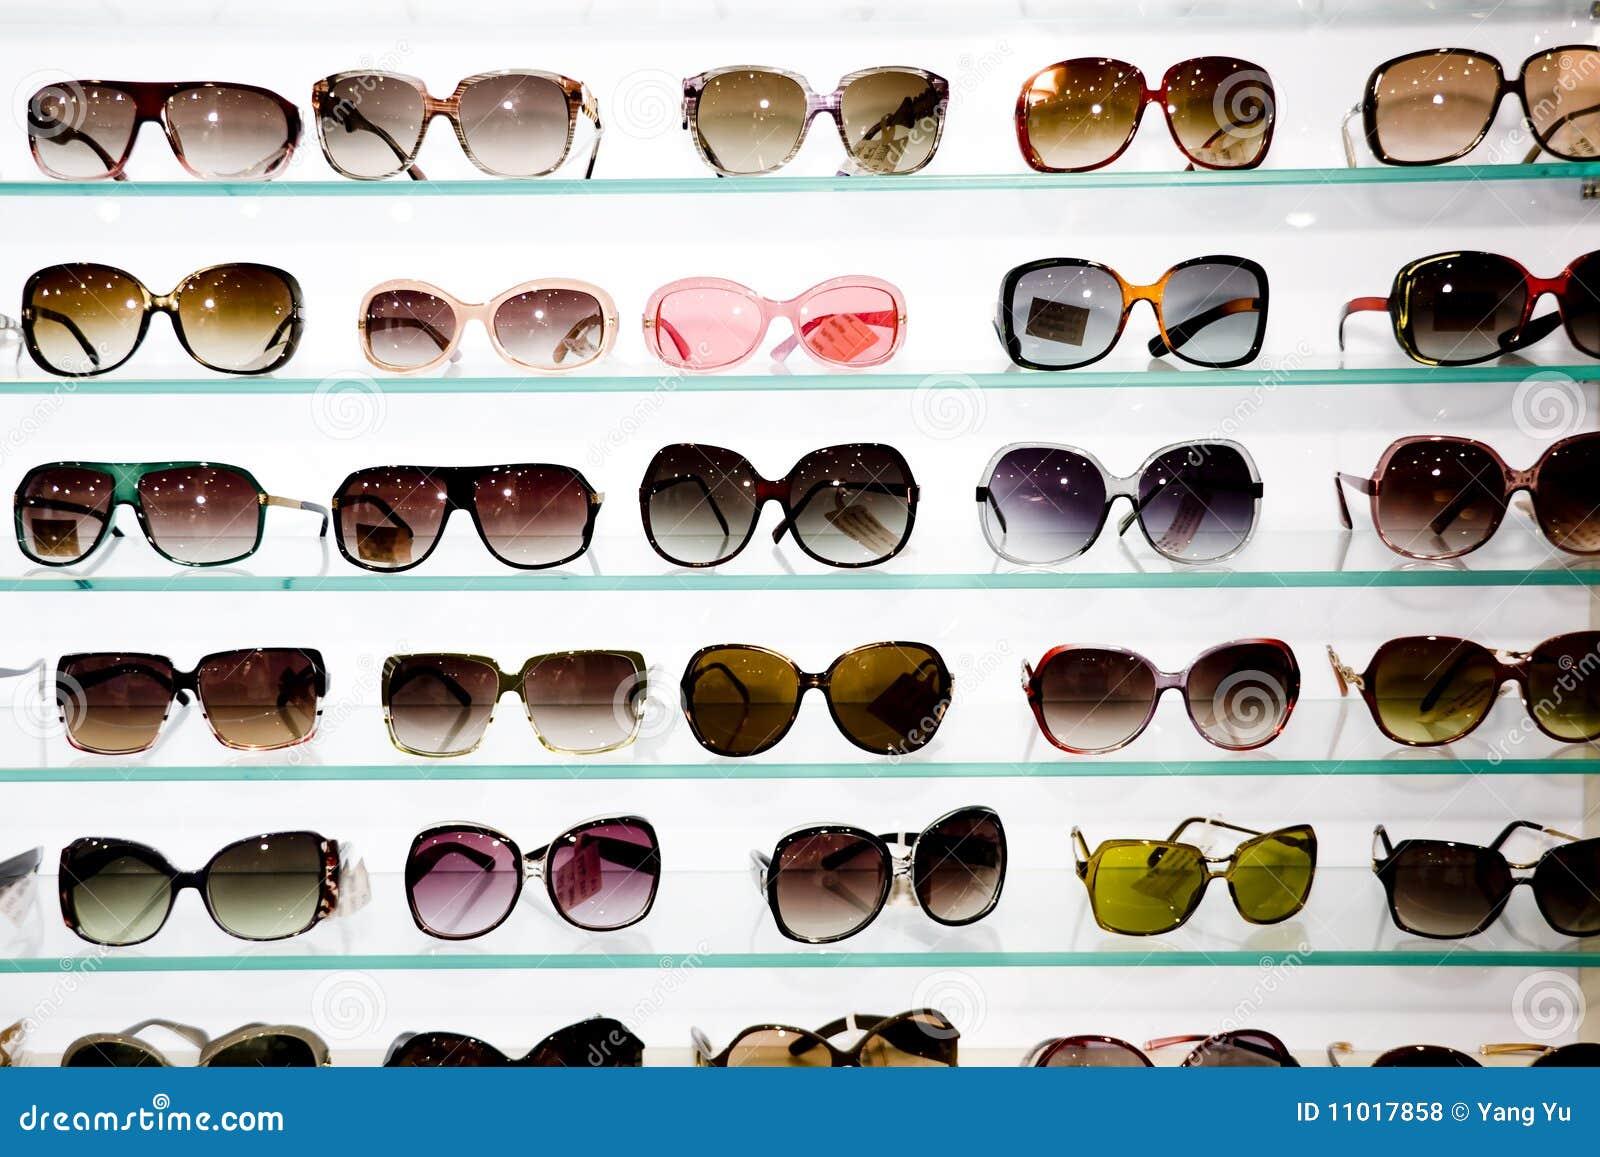 Eyeglasses display - Eyeglasses Display Shelves Royalty Free Stock Photos